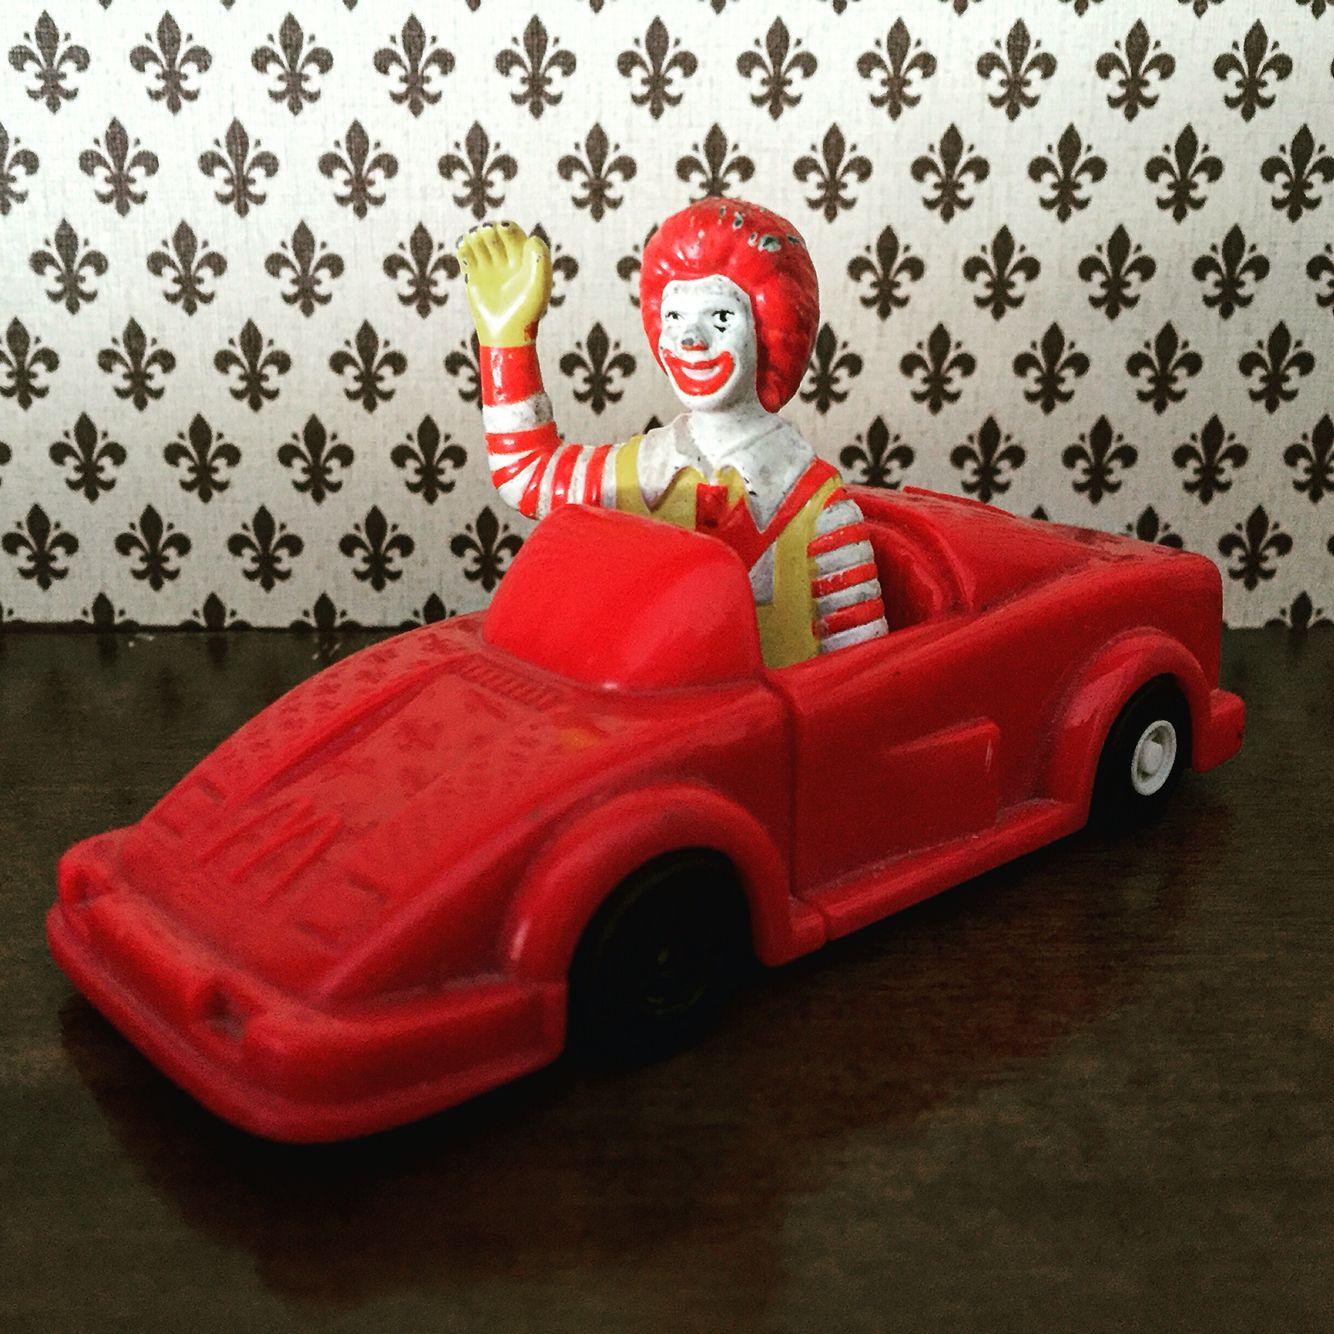 Ronald McDonald 1995. Vintage toys